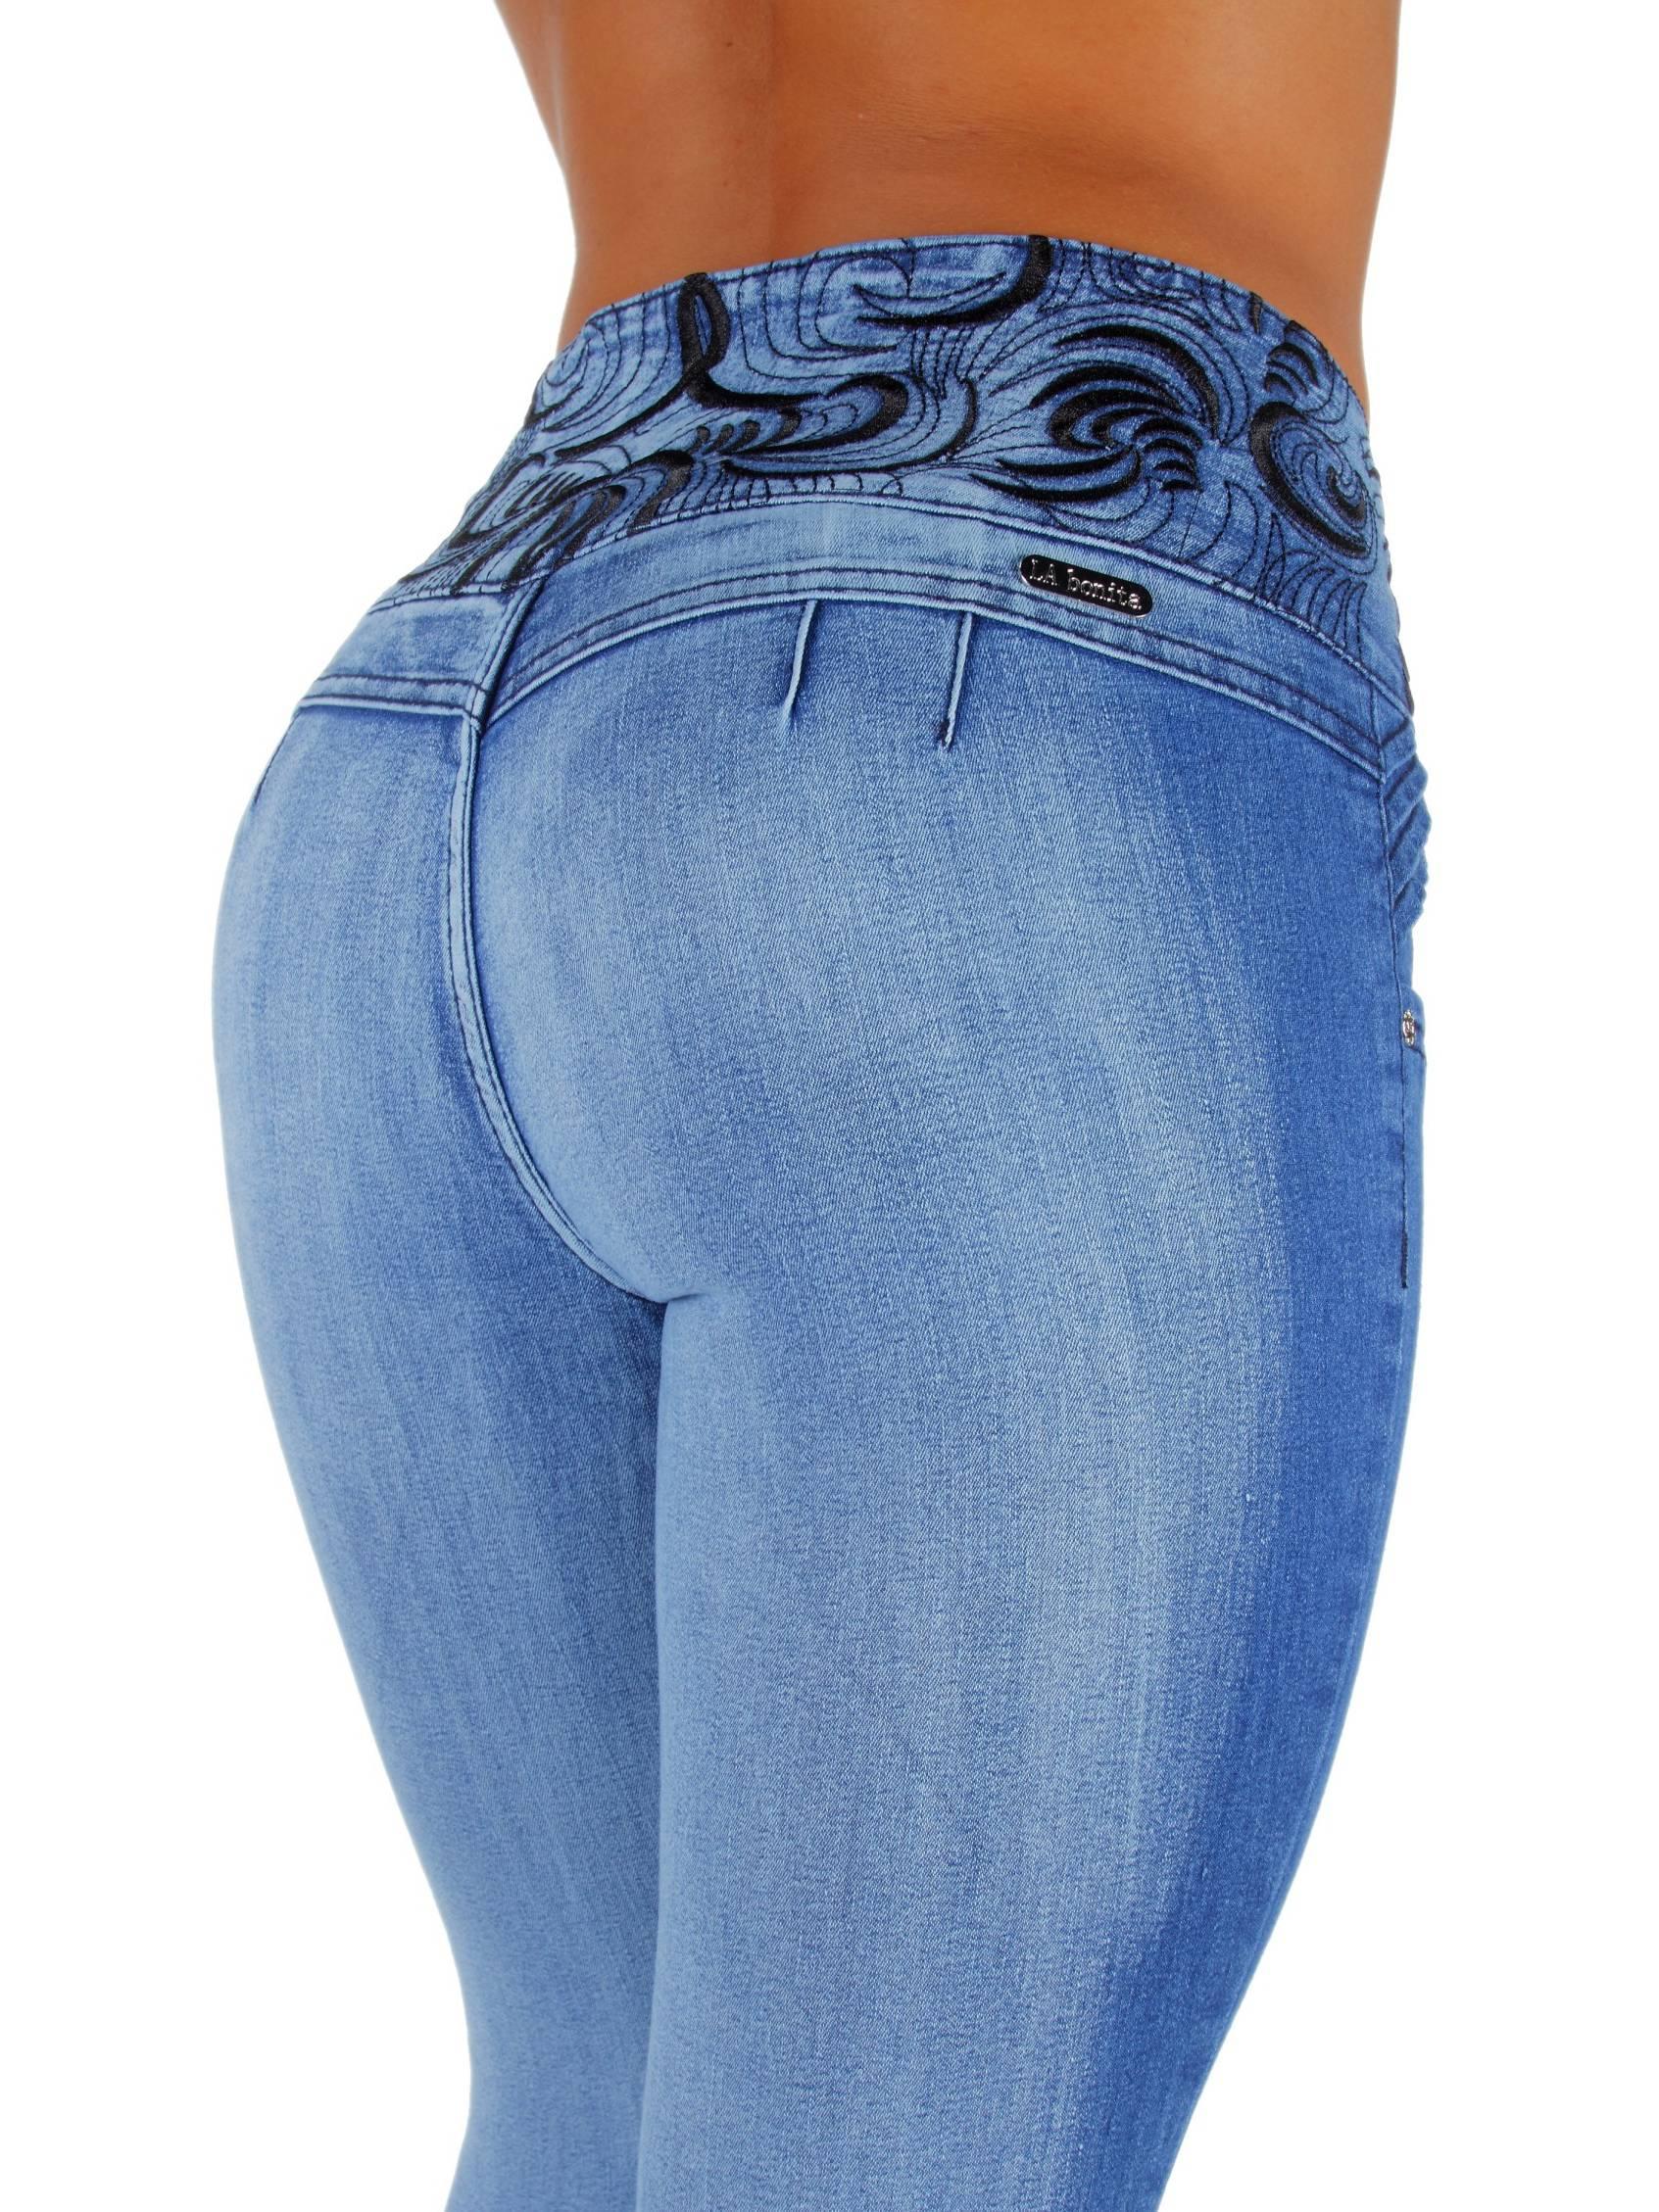 Colombian Design, Mid Waist, Butt Lift, Skinny Jeans